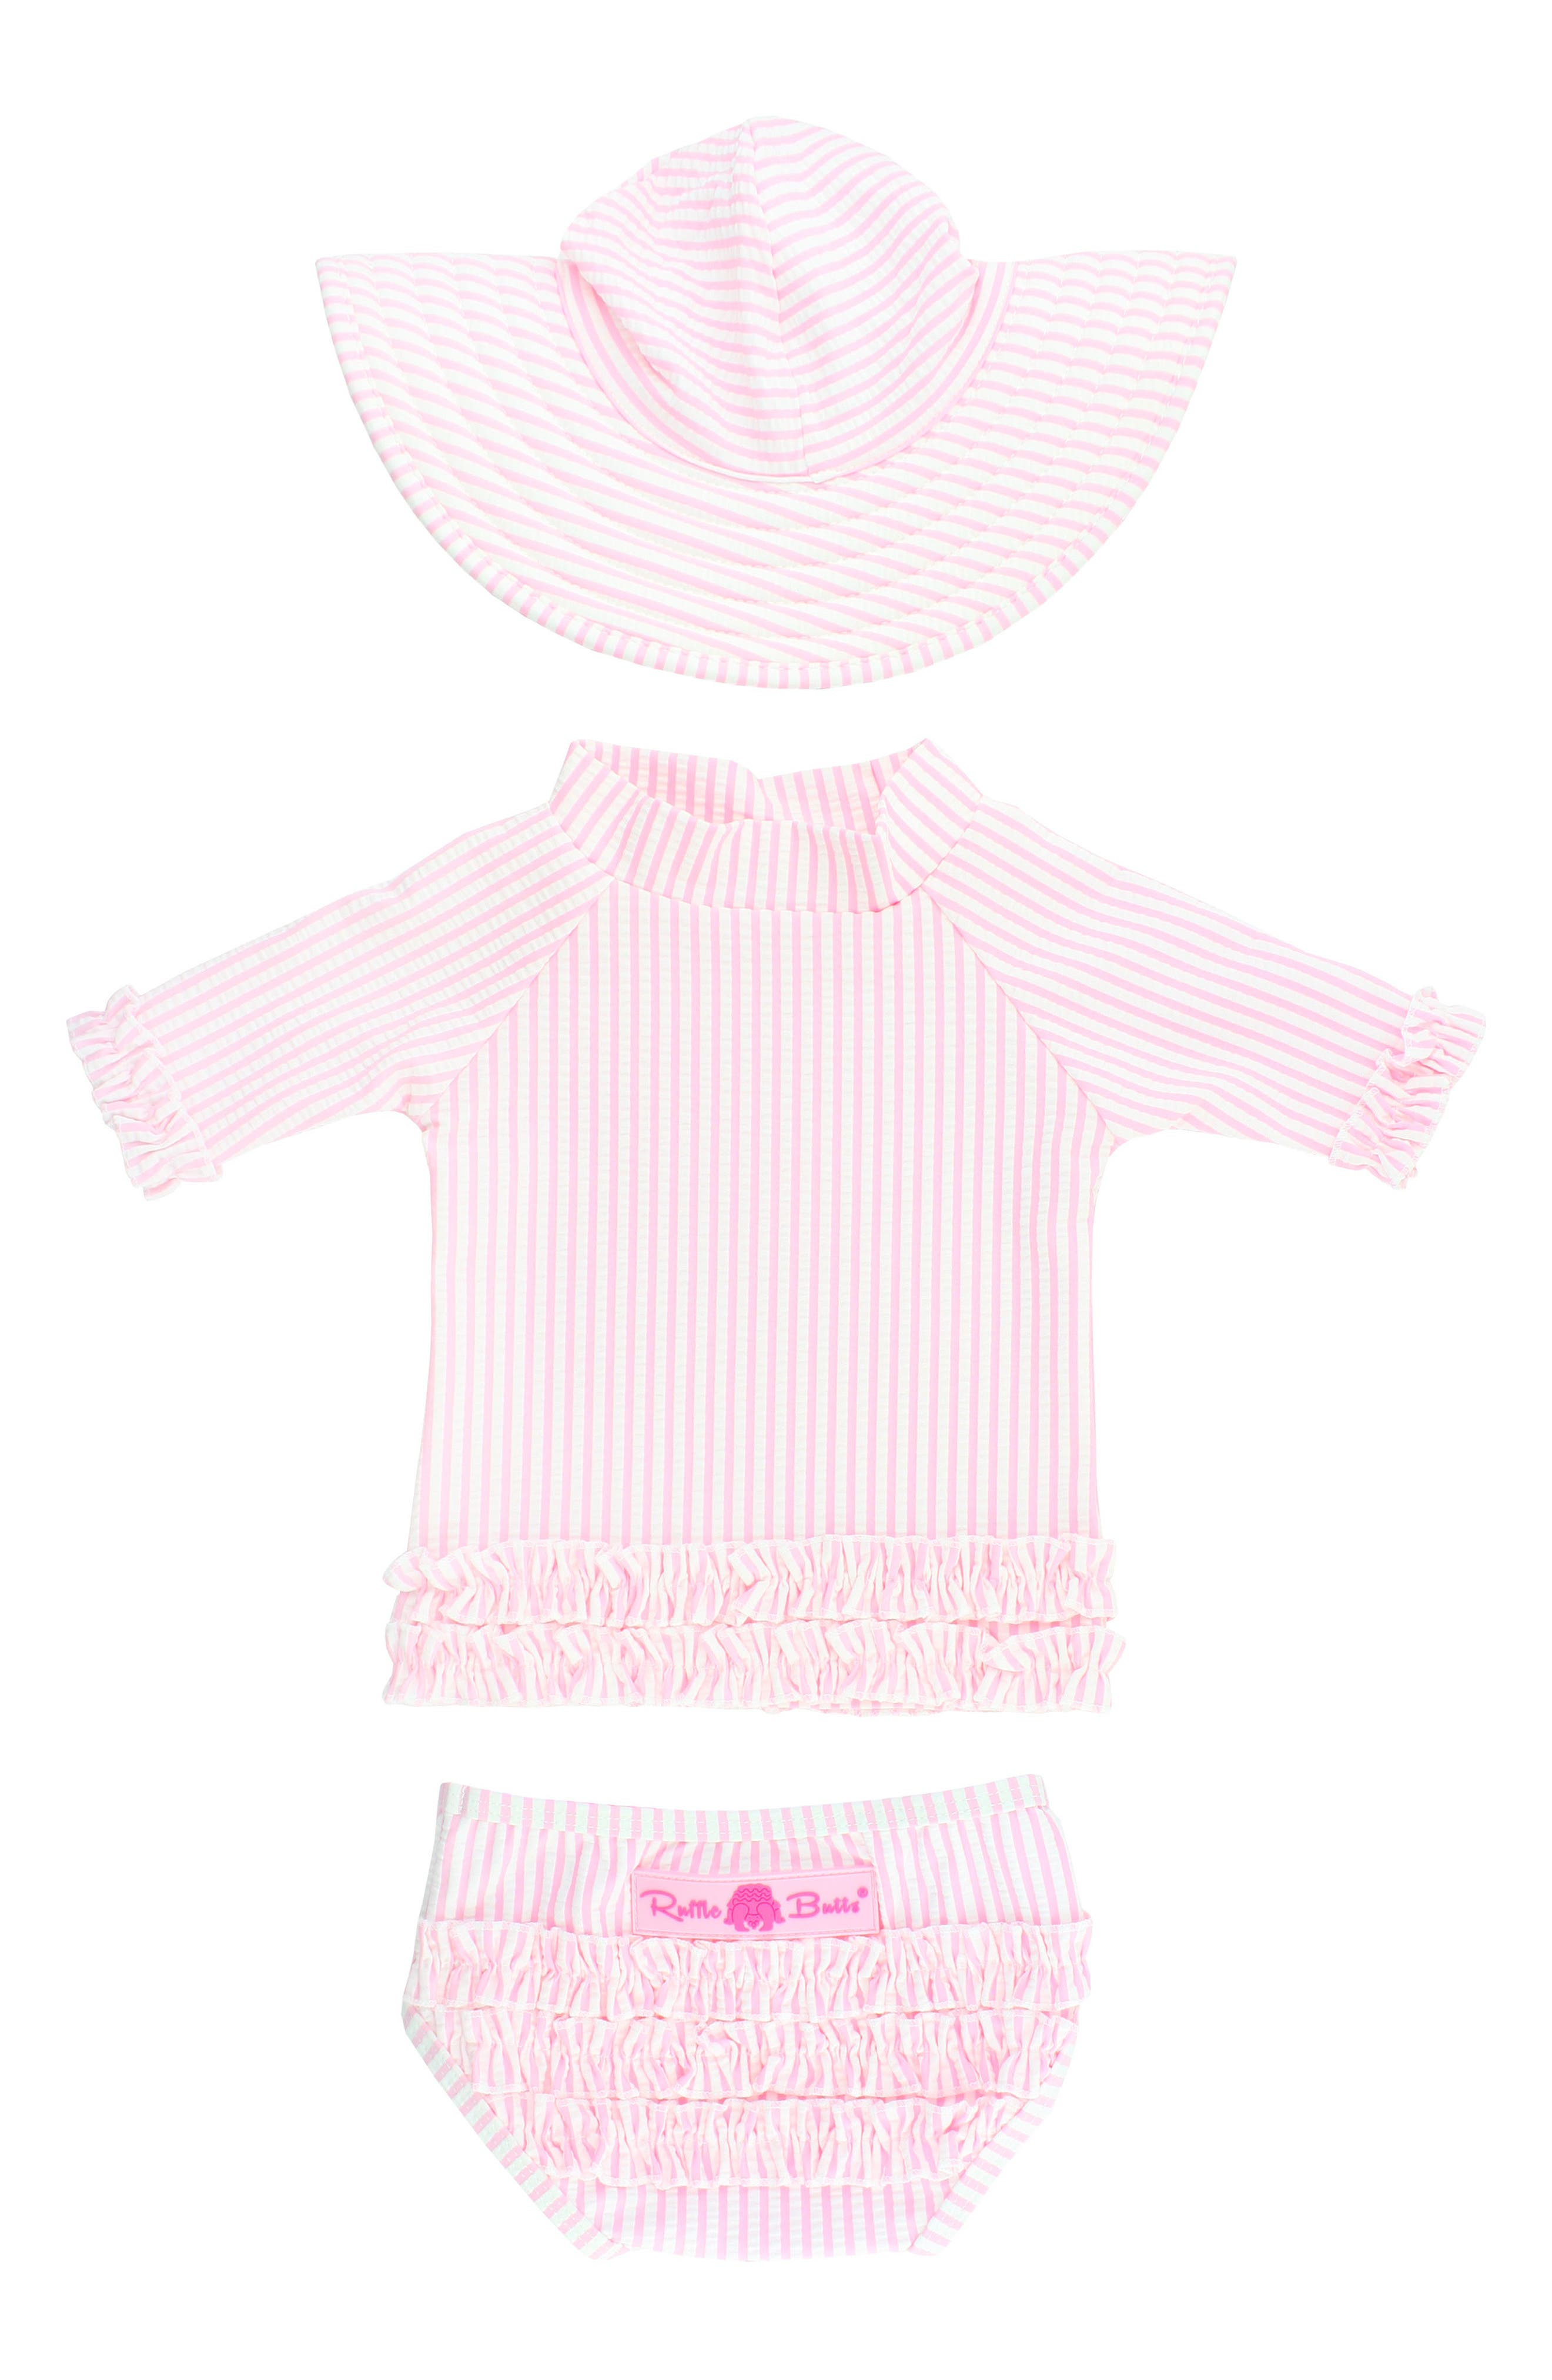 RUFFLEBUTTS Seersucker Two-Piece Rashguard Swimsuit & Hat Set, Main, color, PINK